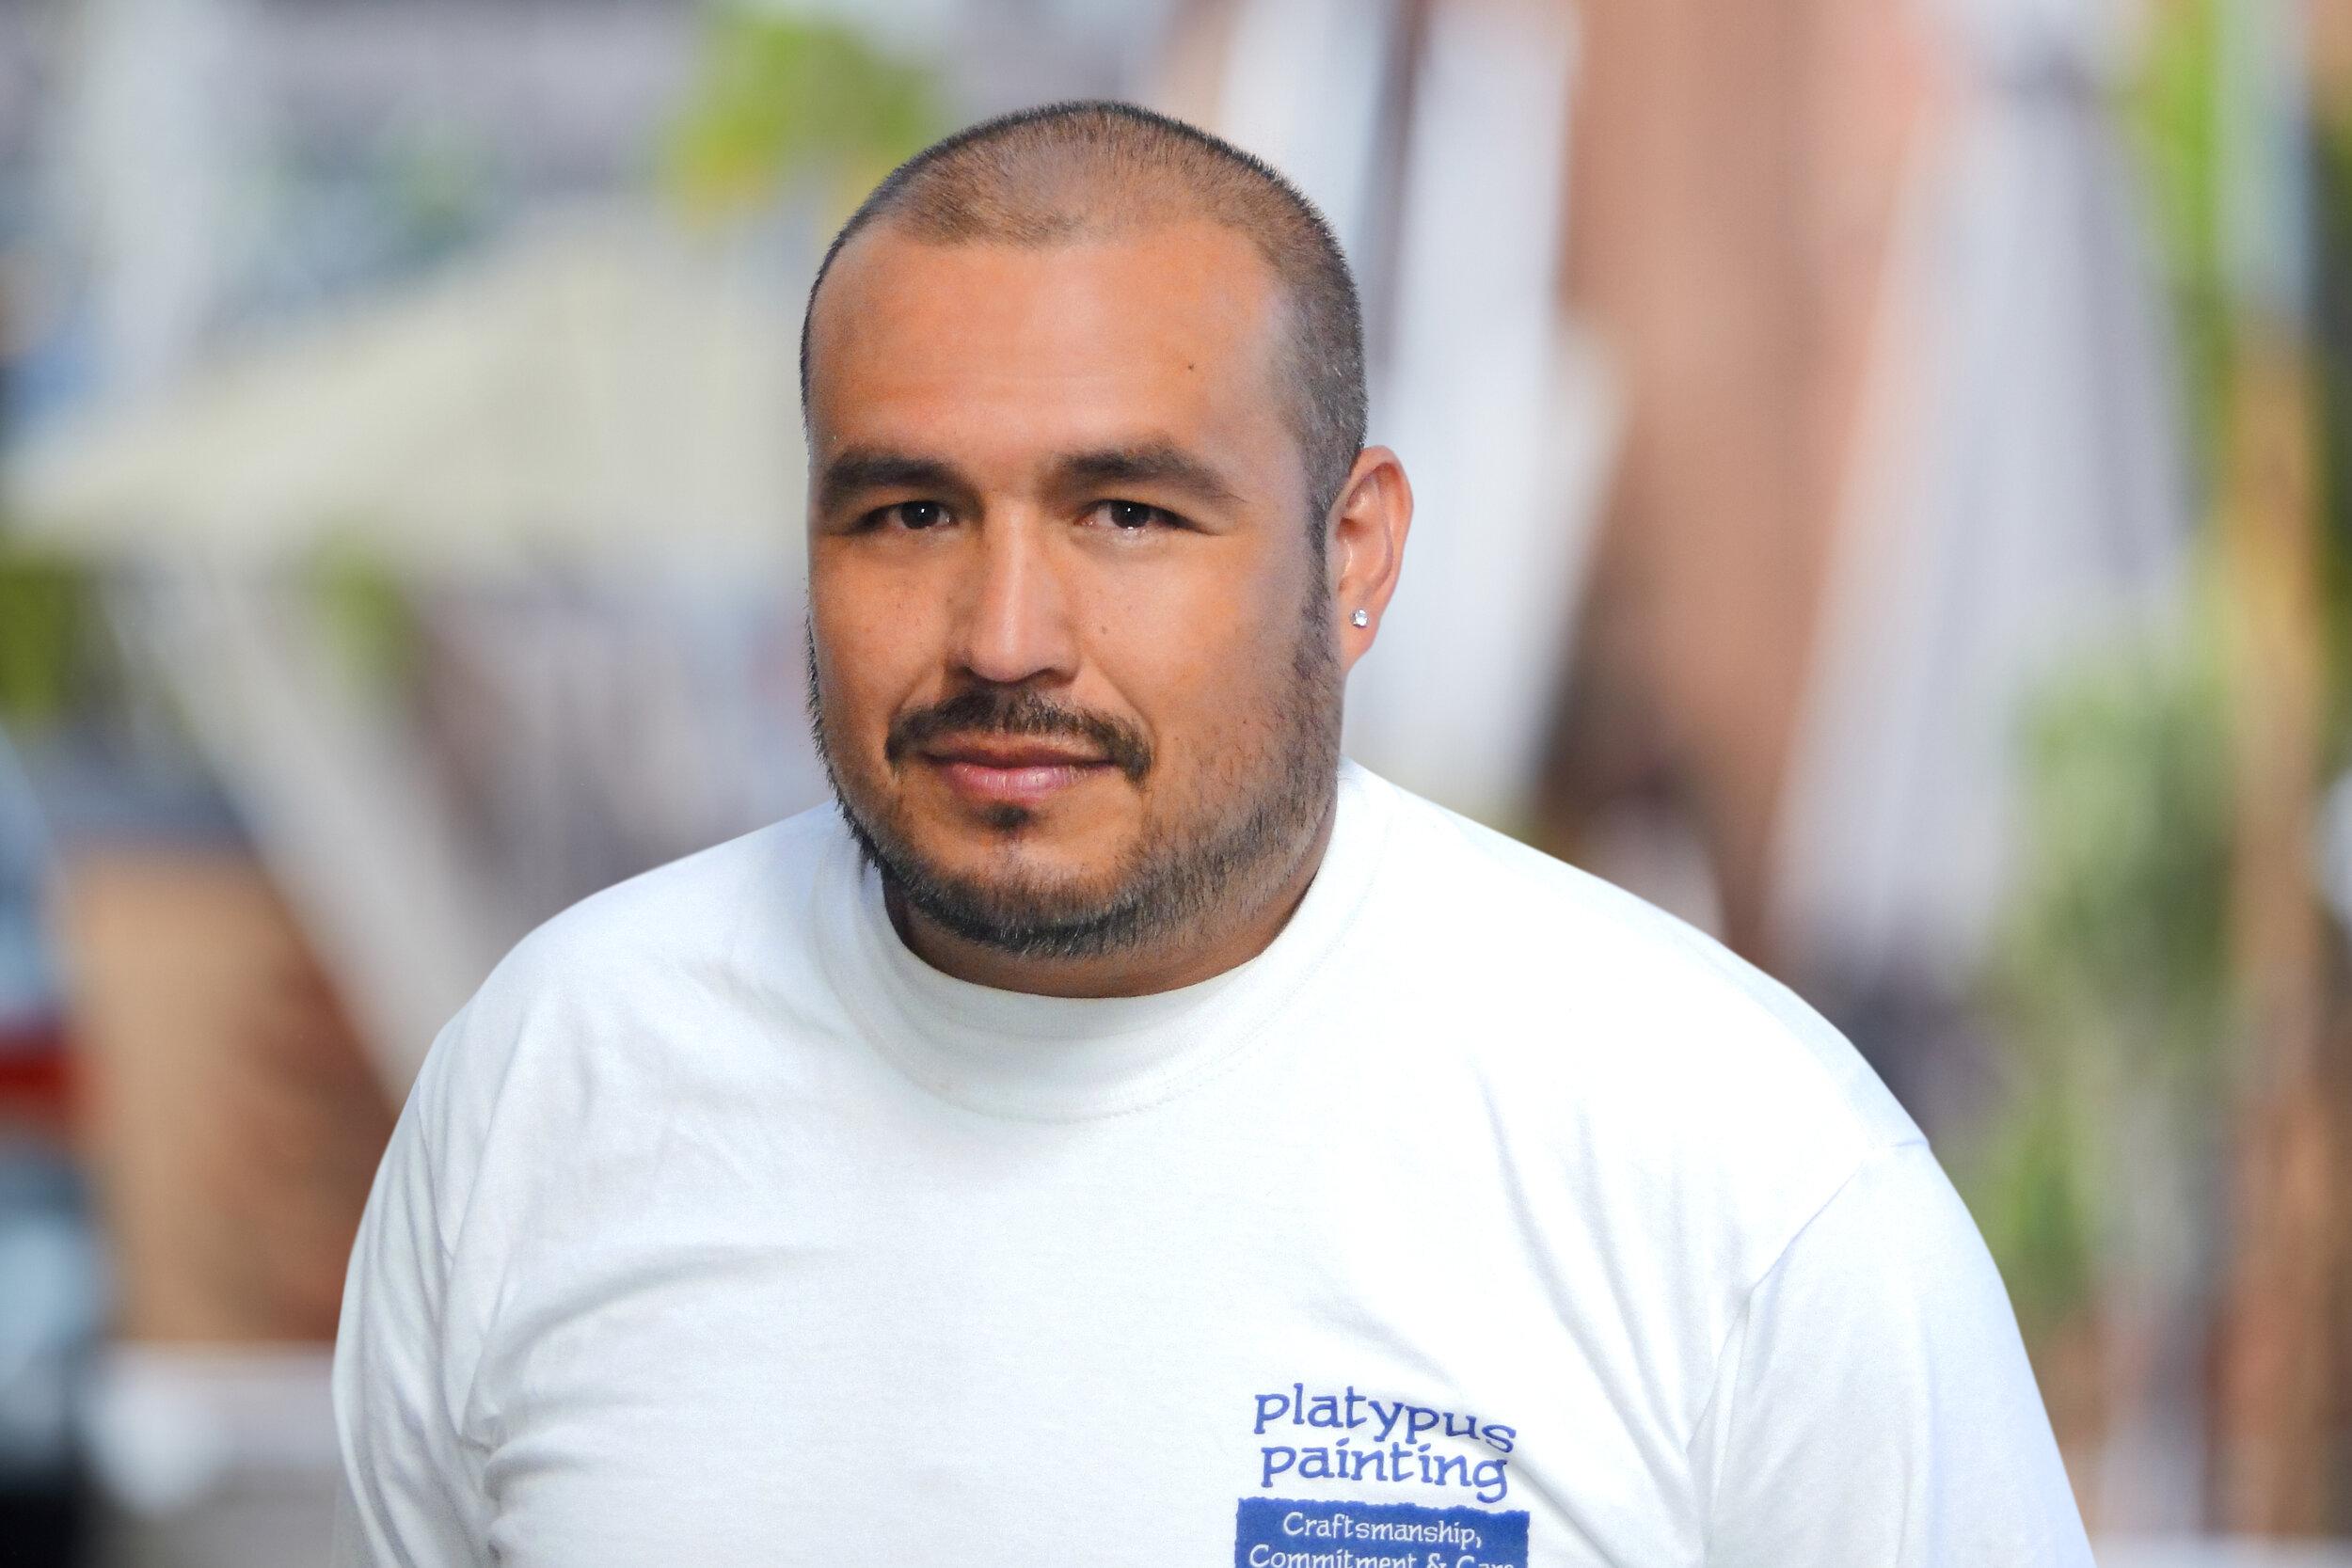 Francisco, Painter